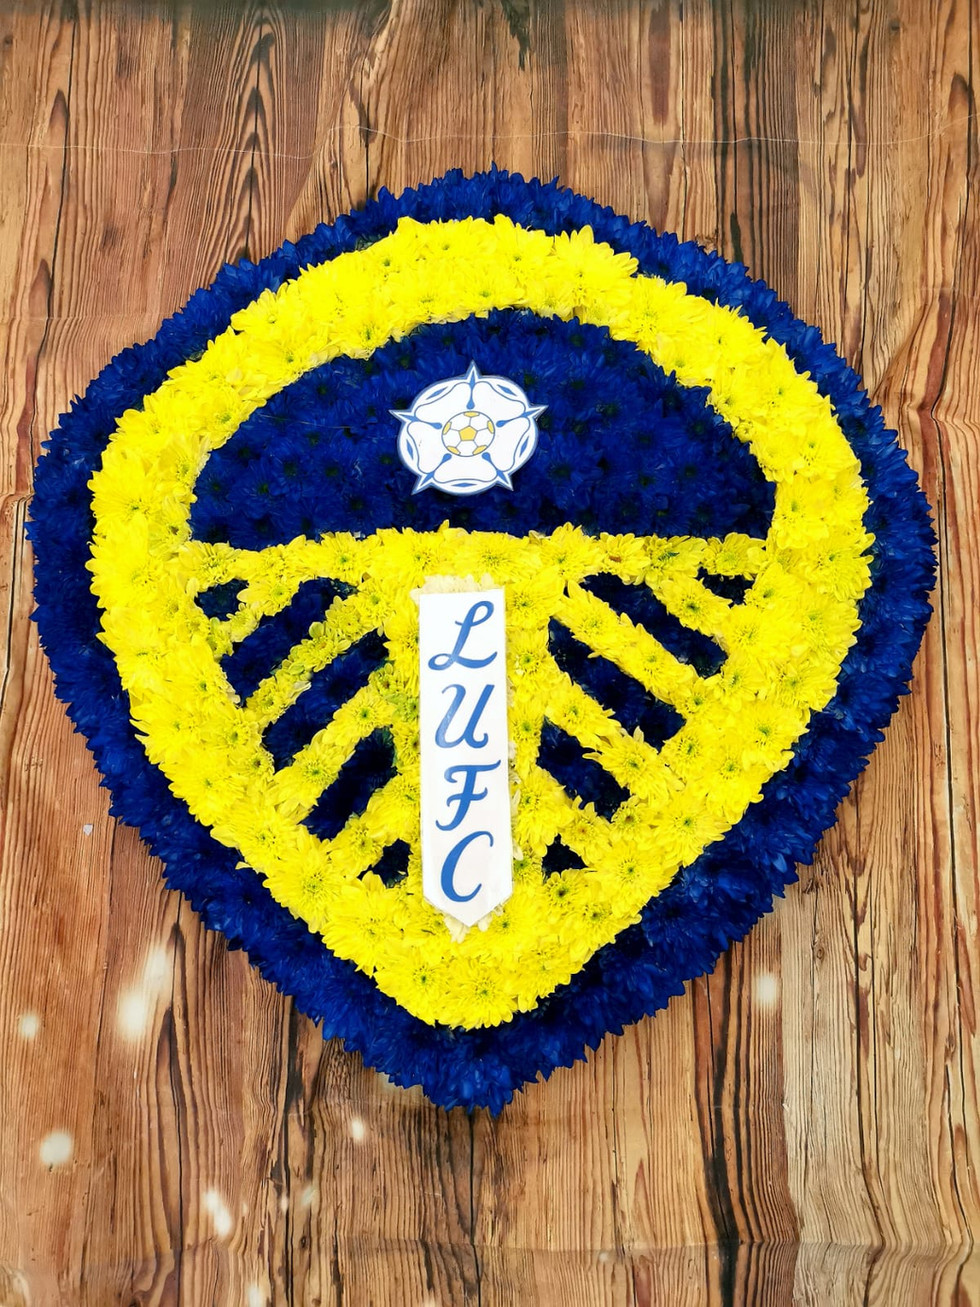 leeds united shield bespoke funeral tribute.jpeg